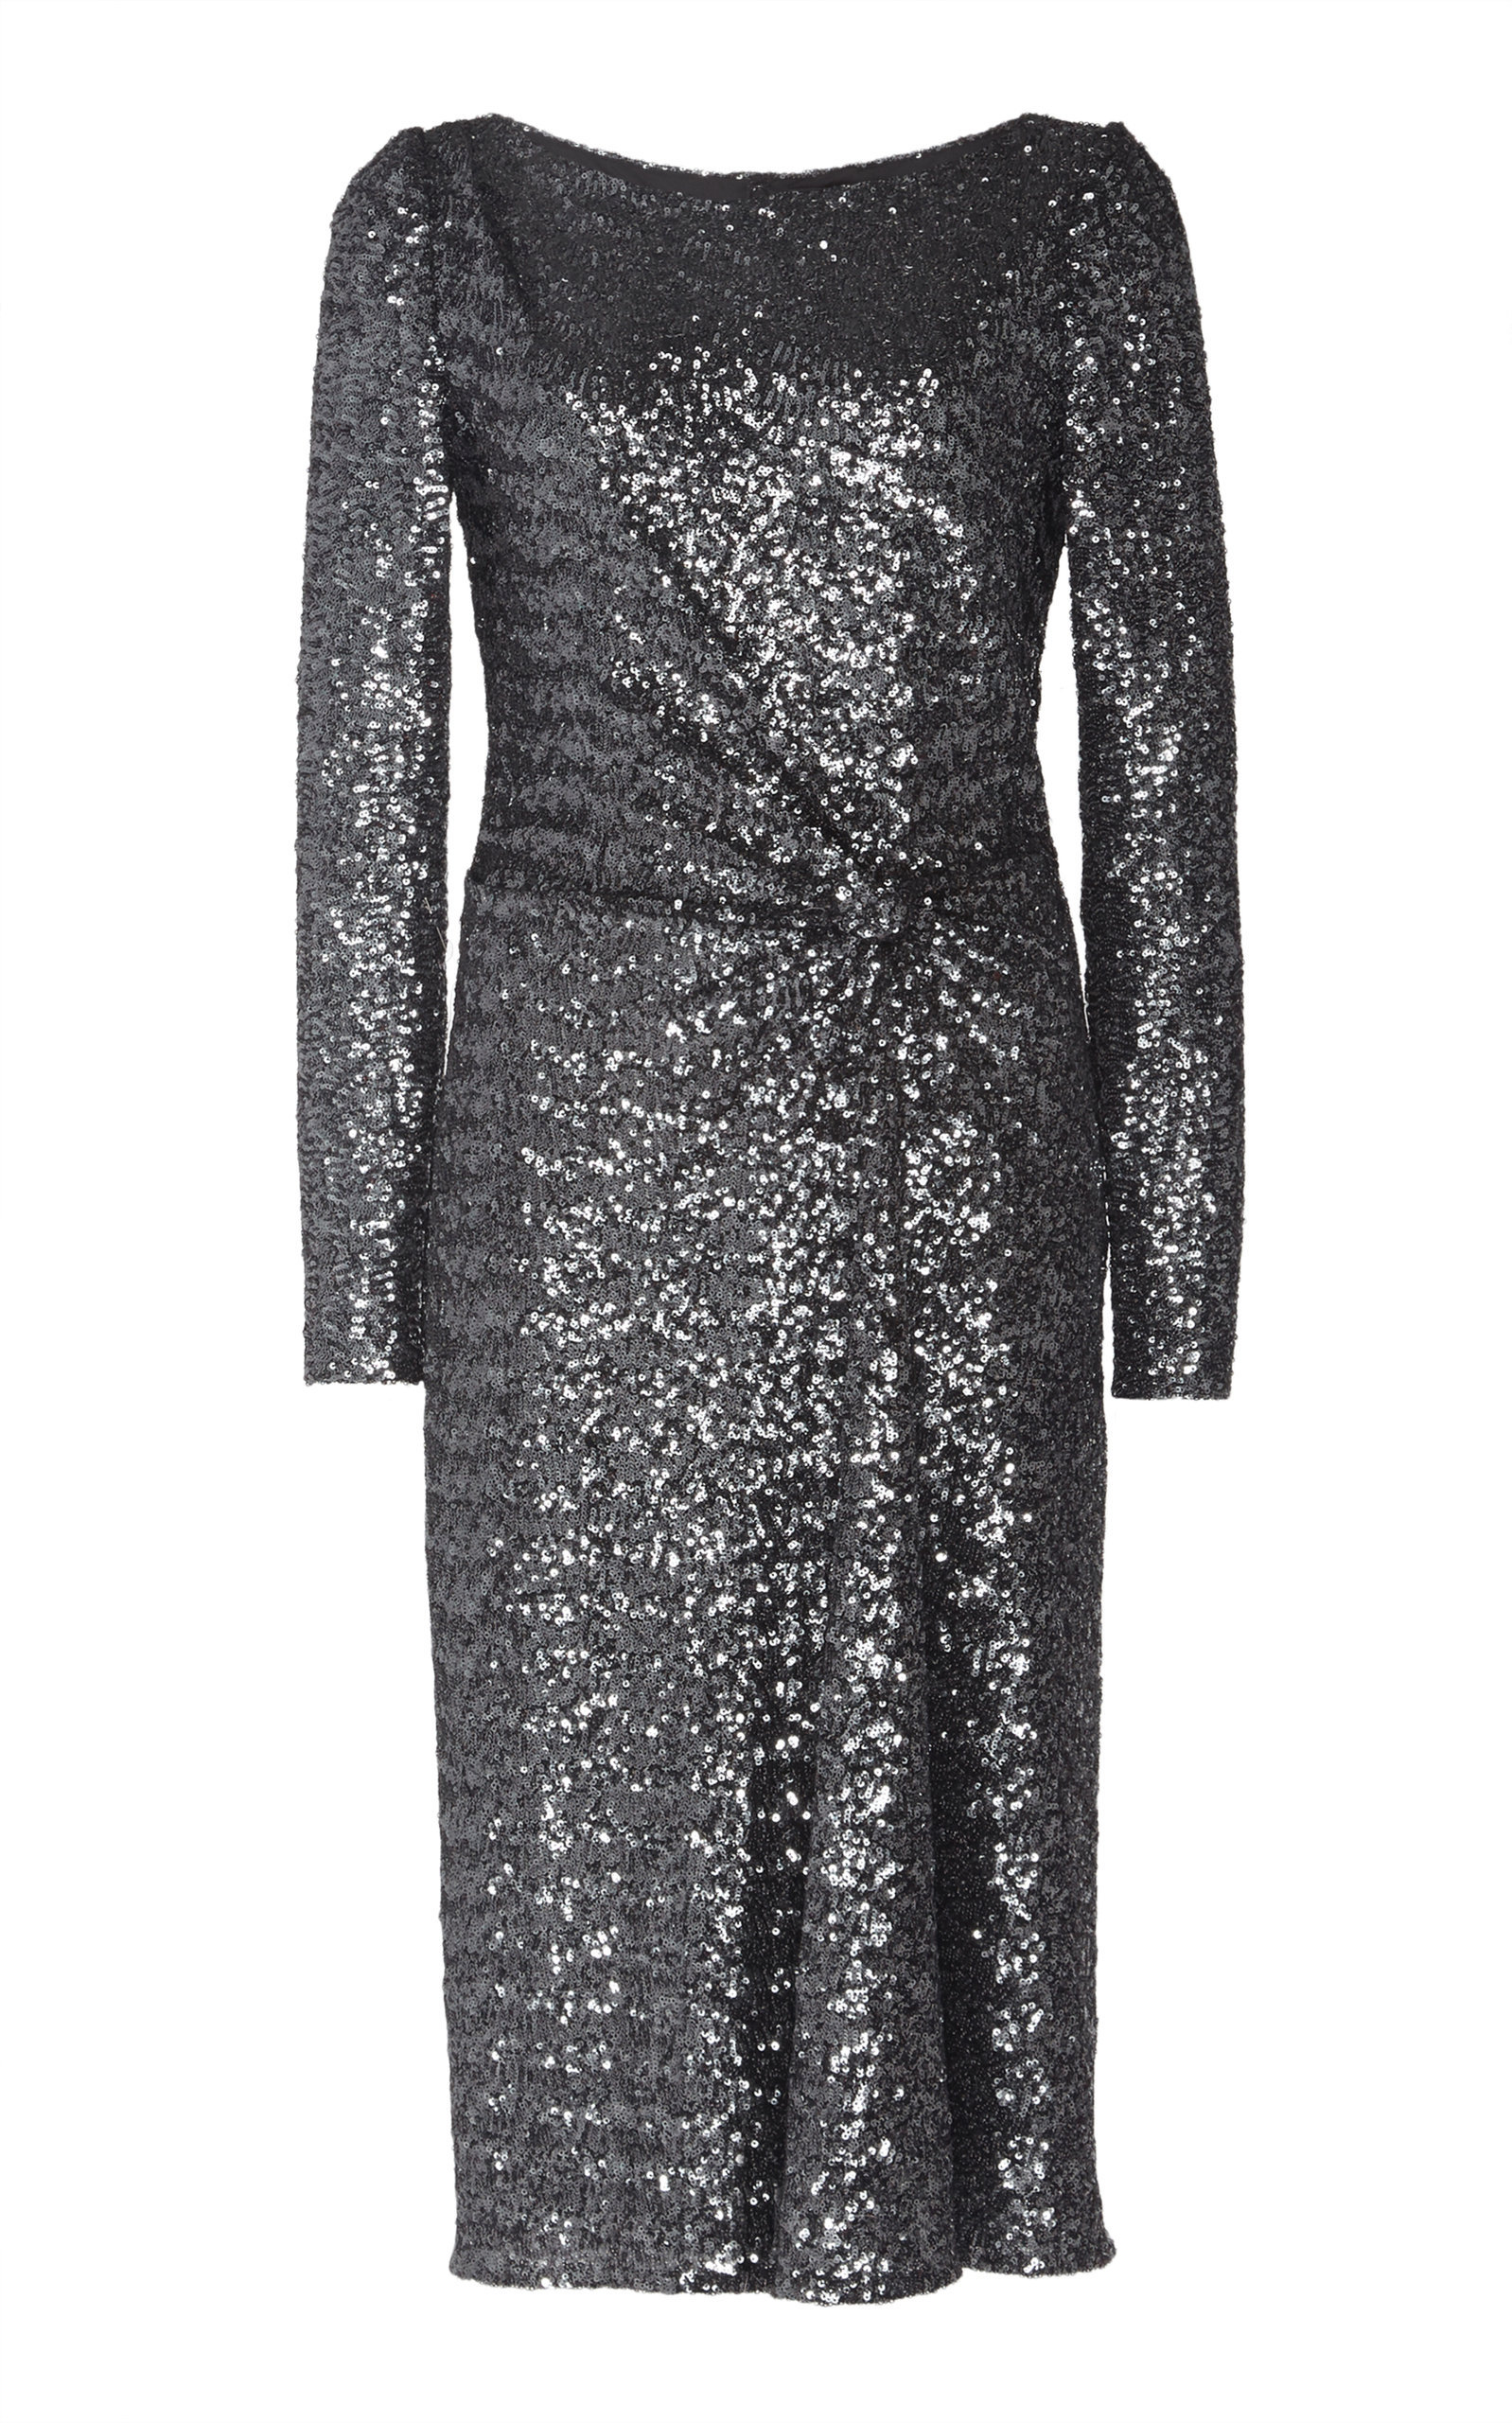 Jenny Packham Alisse Gathered Waist Sequin Dress In Grey